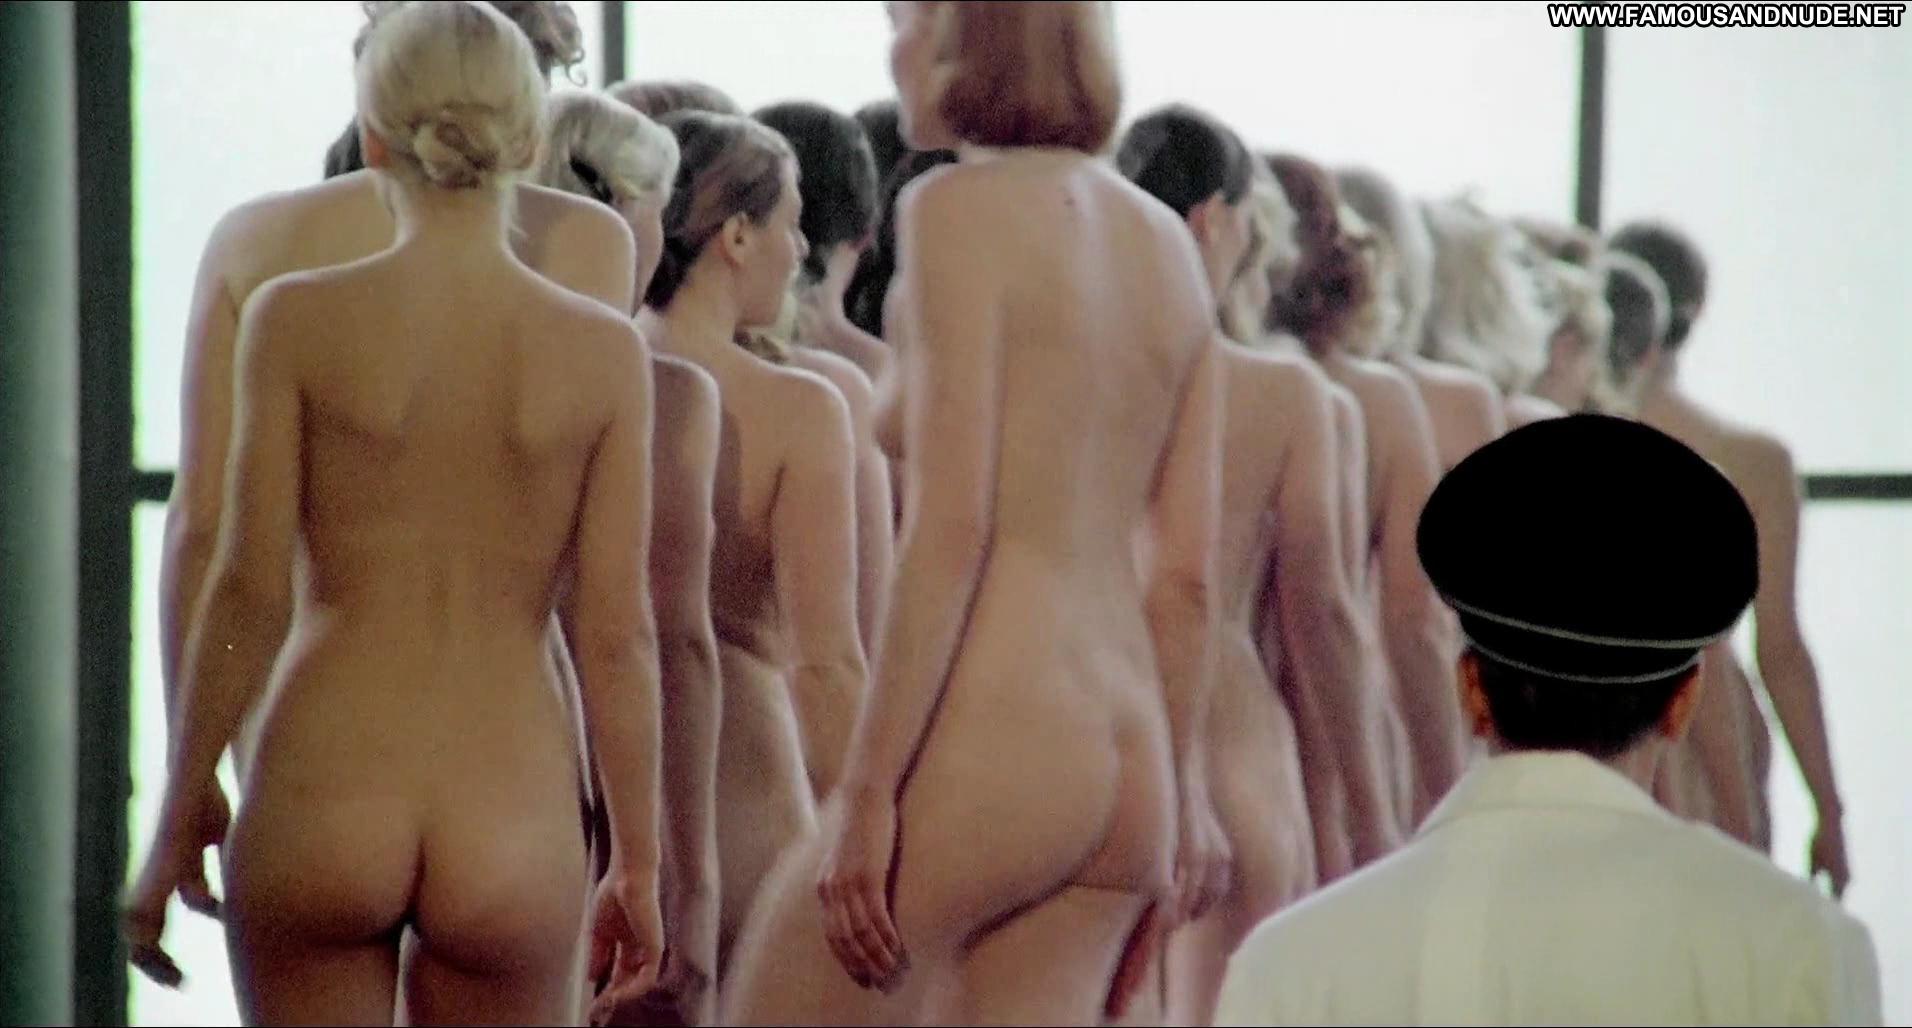 Teresa ann savoy salon kitty celebrity posing hot orgy